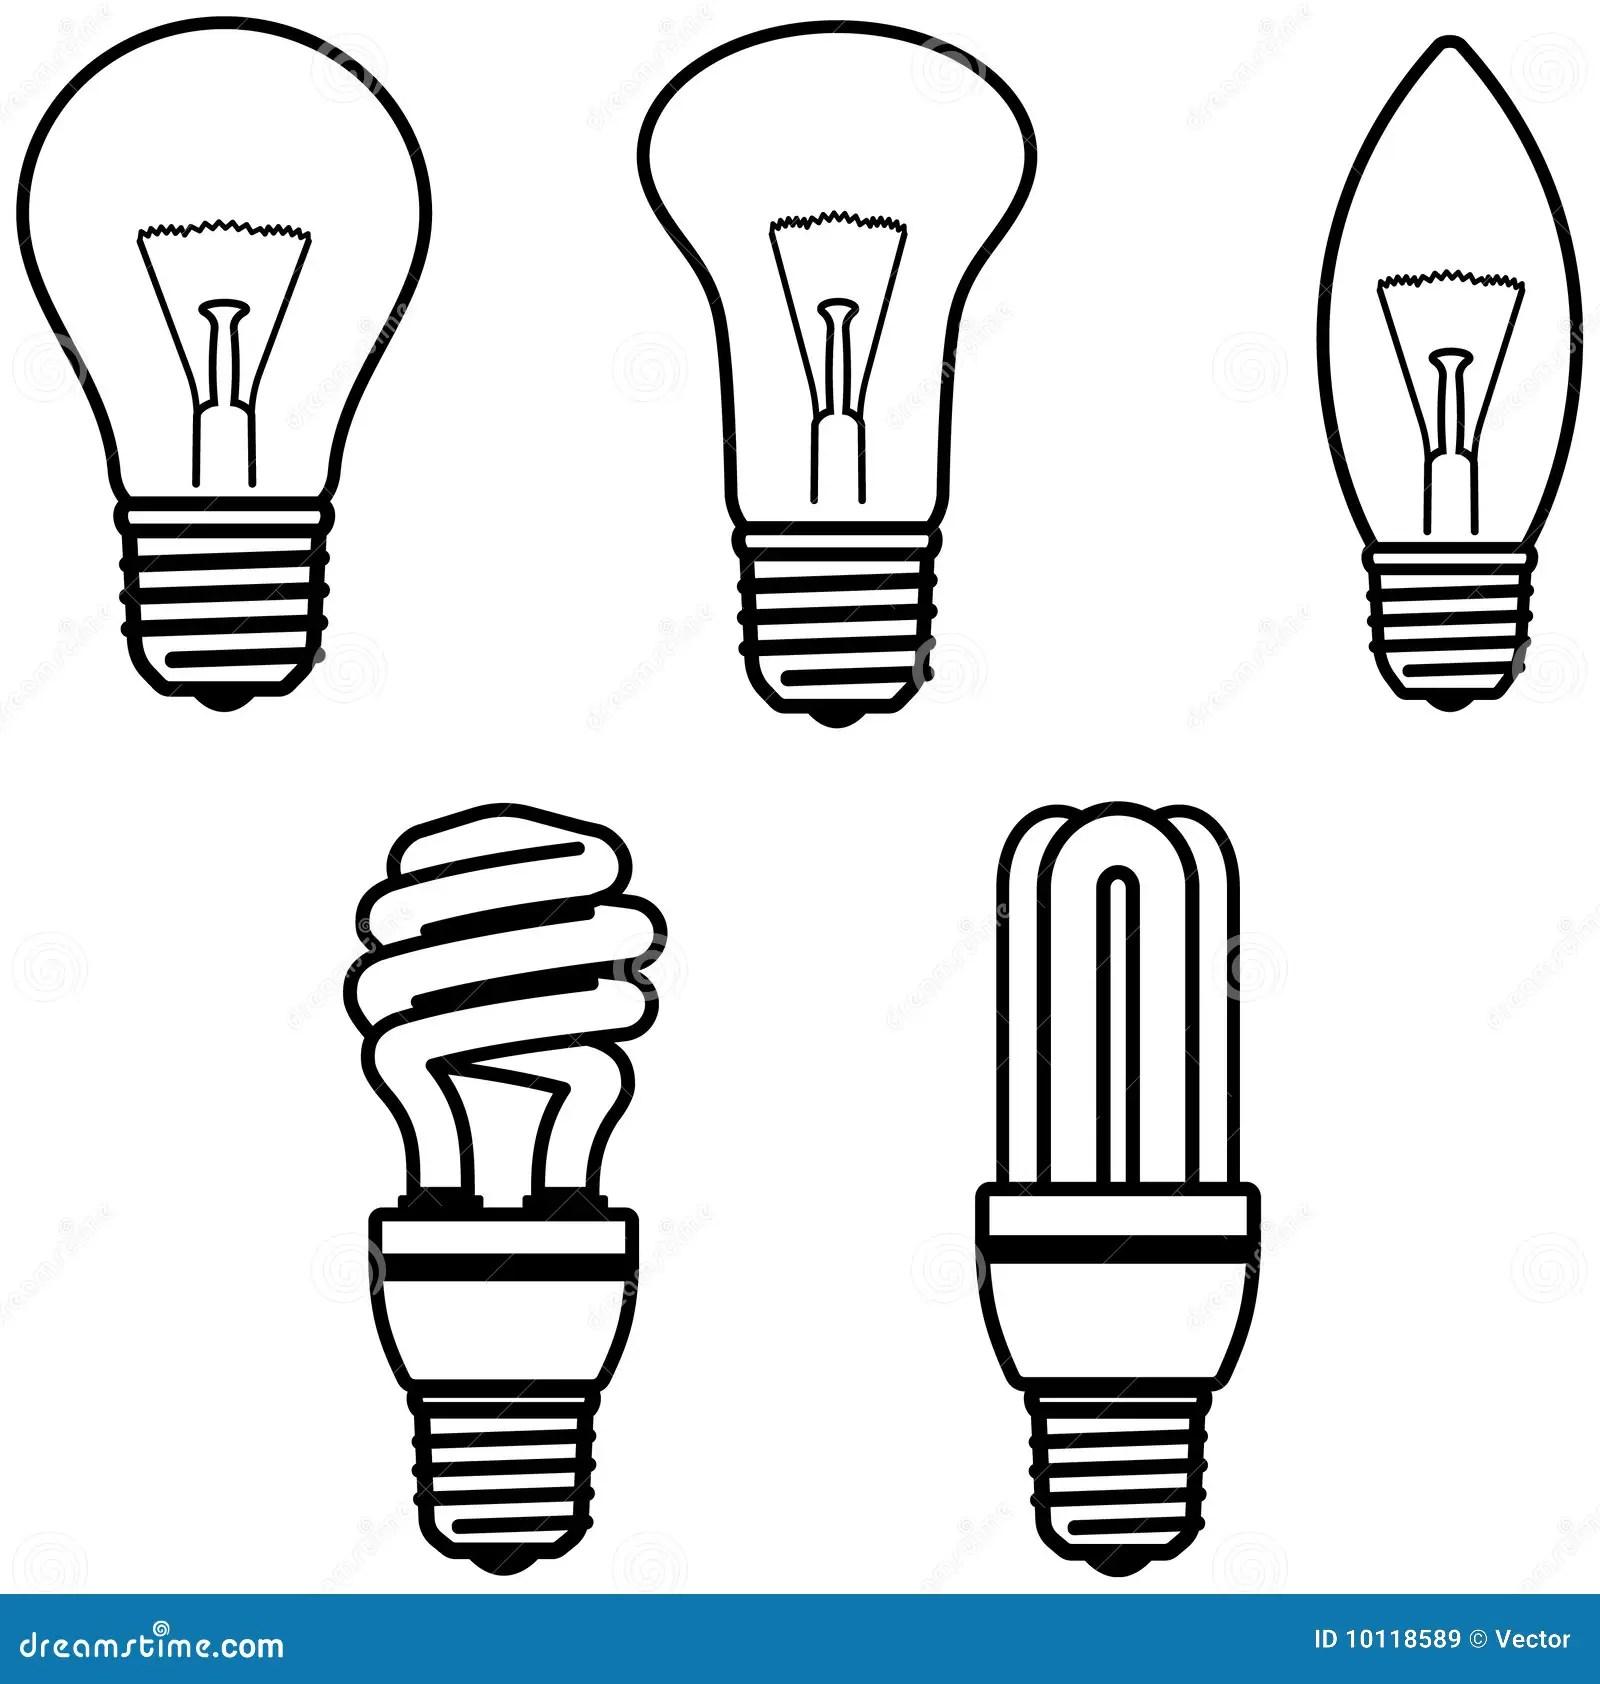 Light Bulbs Vector Illustration Royalty Free Stock